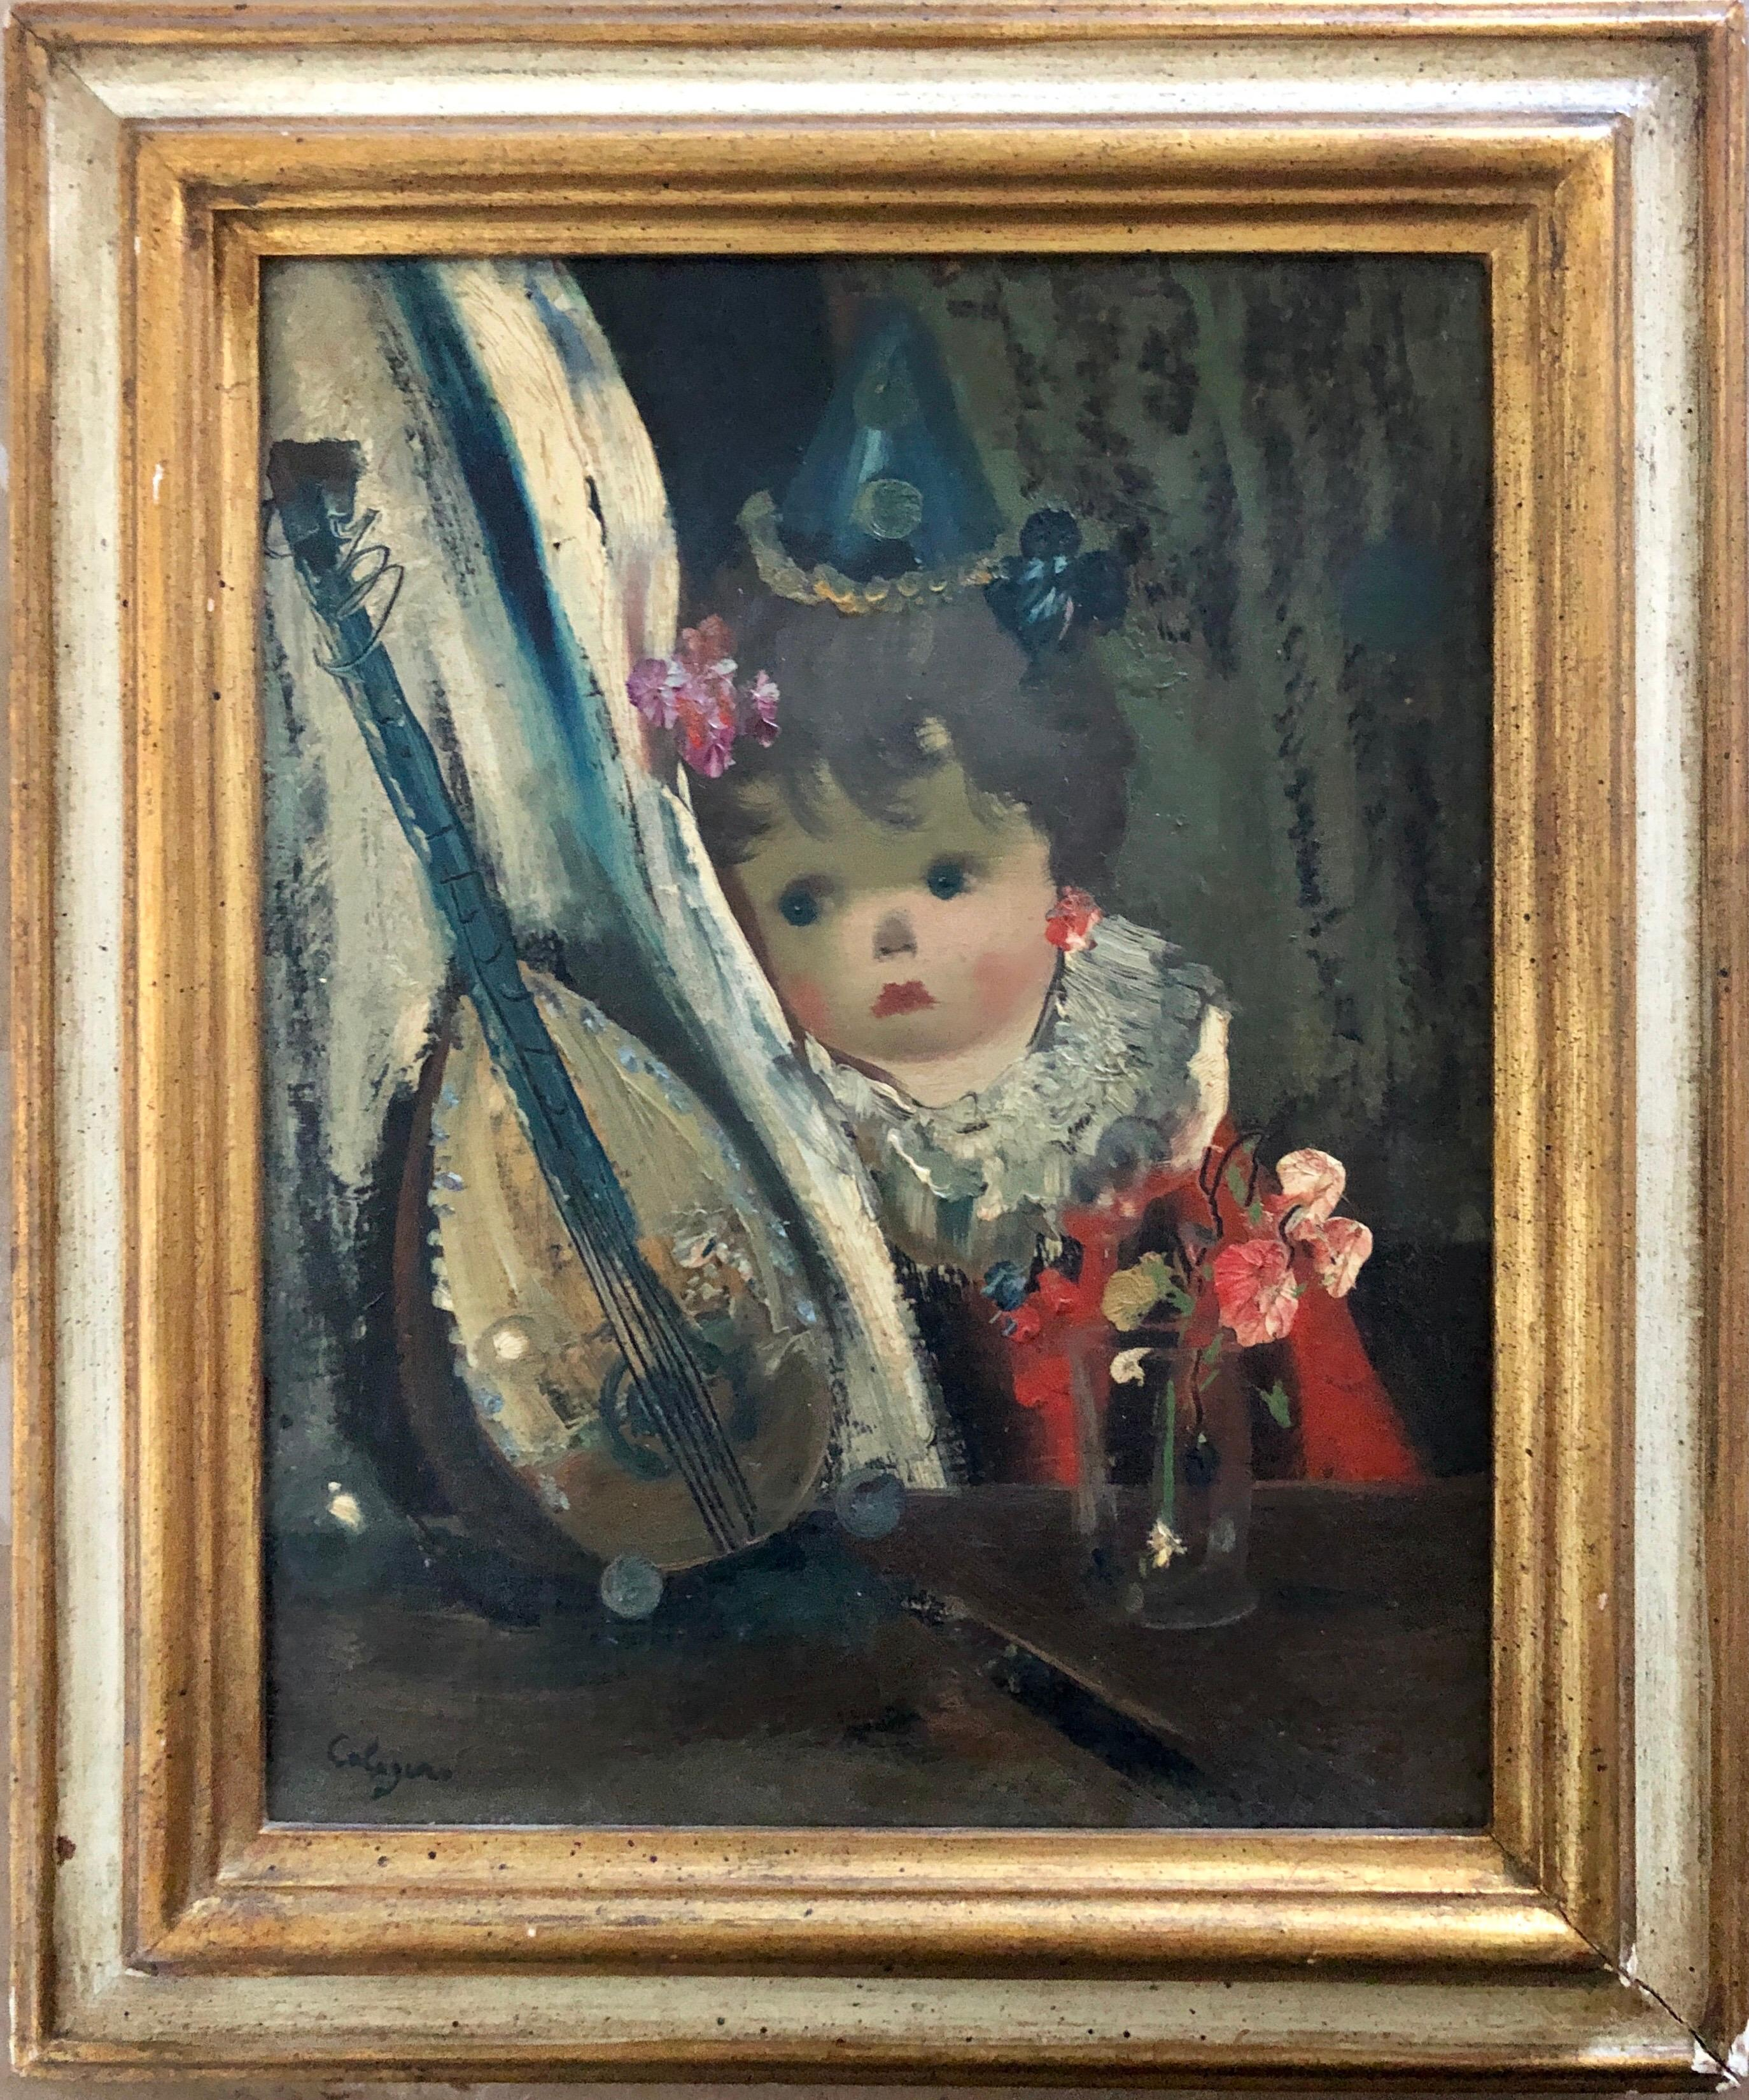 Italian Surrealist Oil Painting Jean Calogero Big Eyed Girl Doll Mandolin Flower